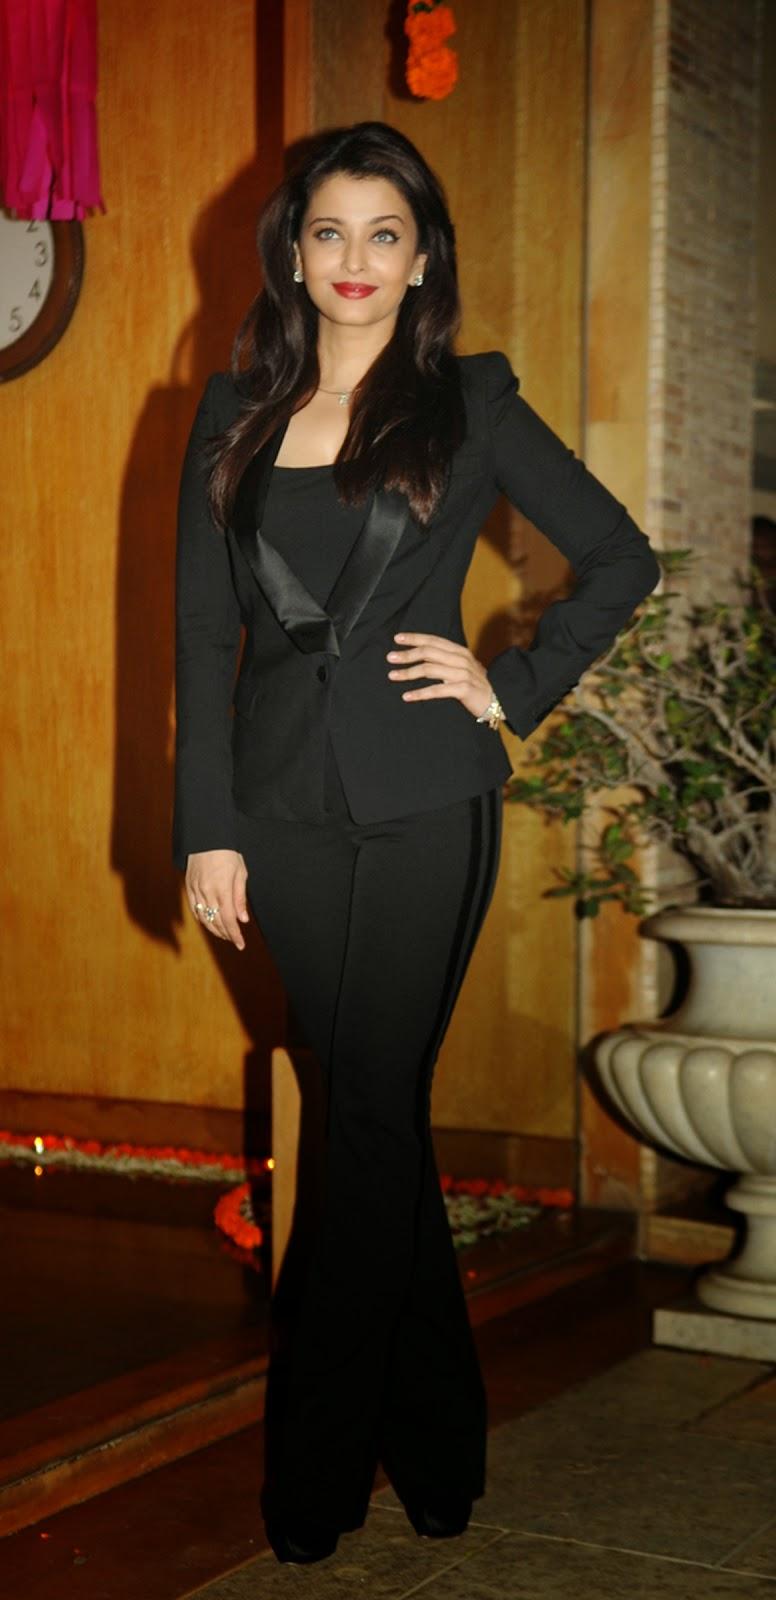 Bollywood actress Aishwarya Rai Bachchan birthday Images